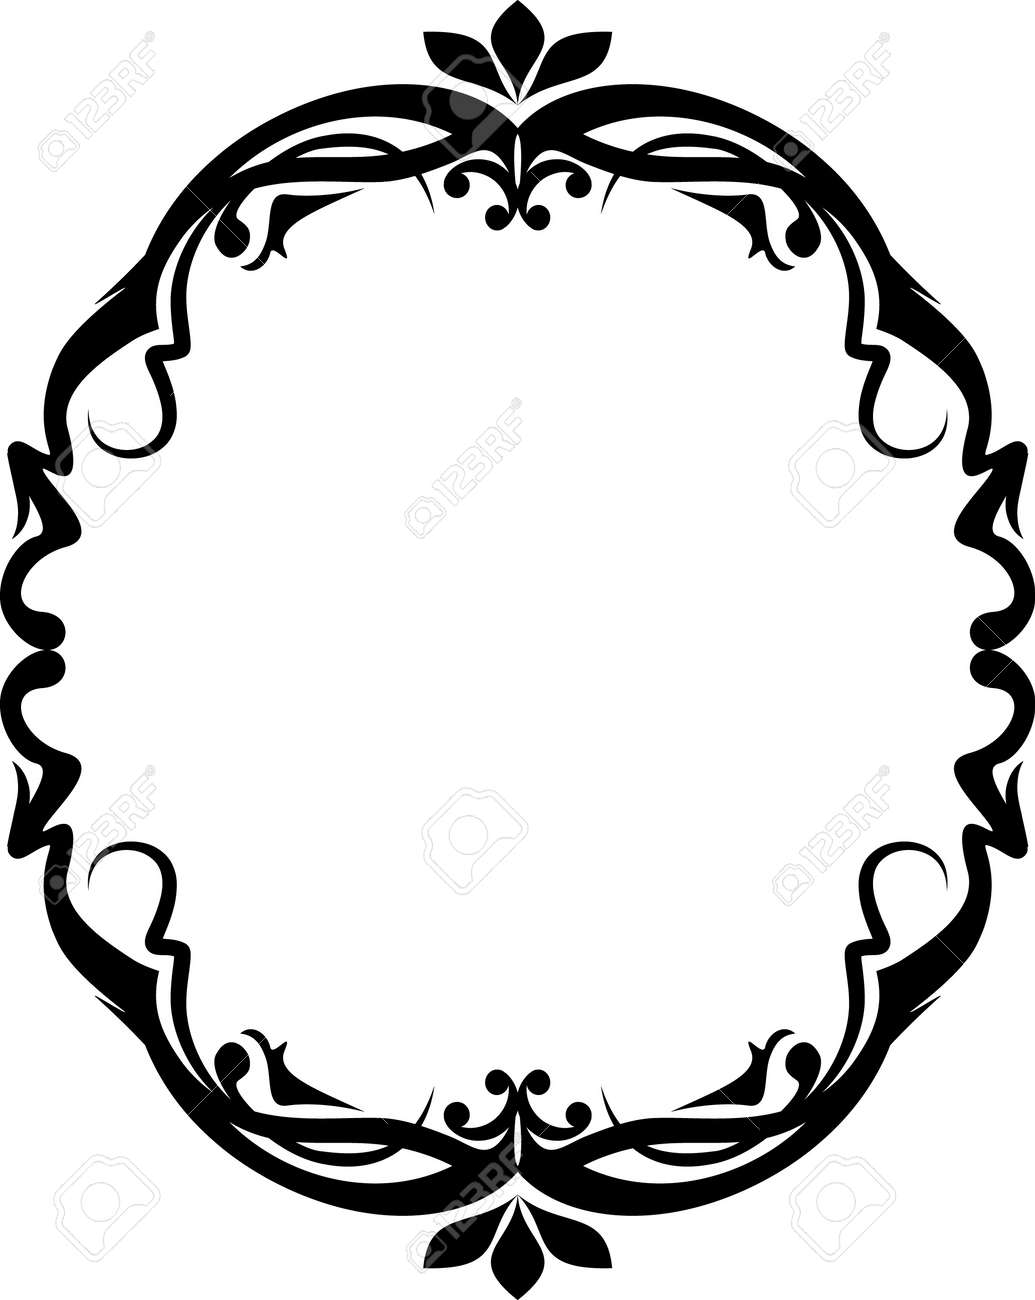 Elegant oval frame - 10707094